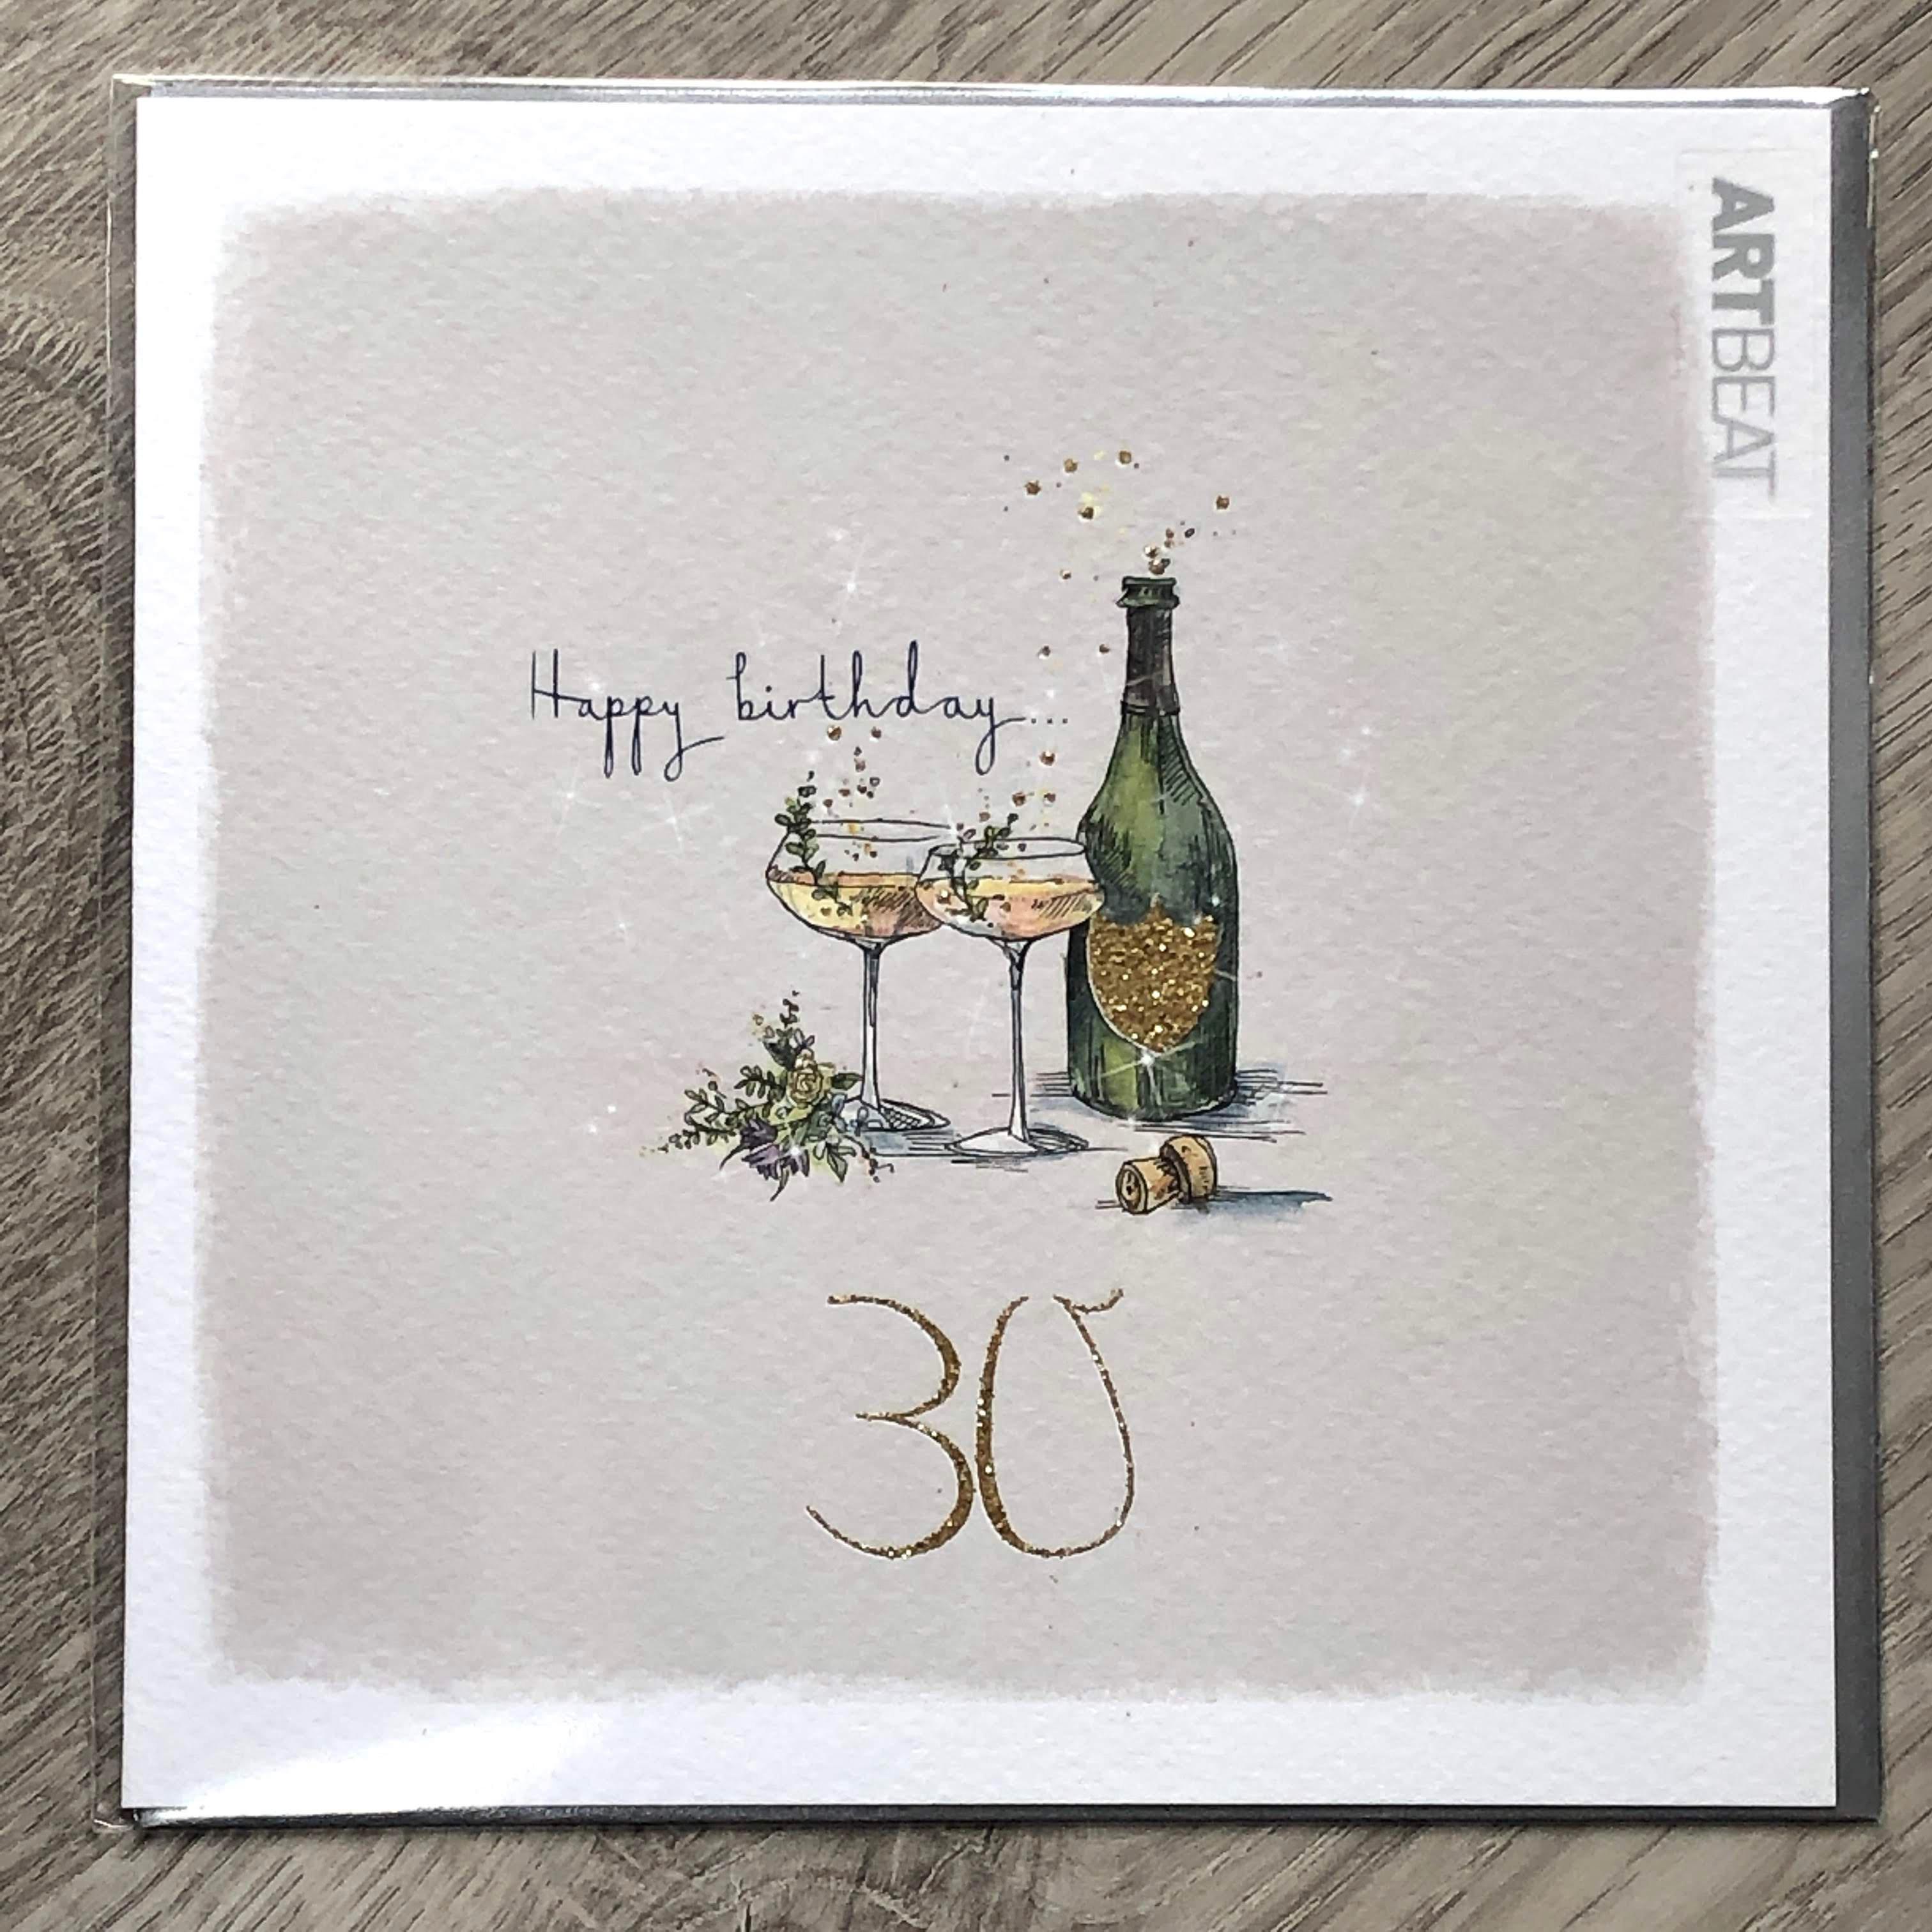 30th Birthday card. Pop the cork